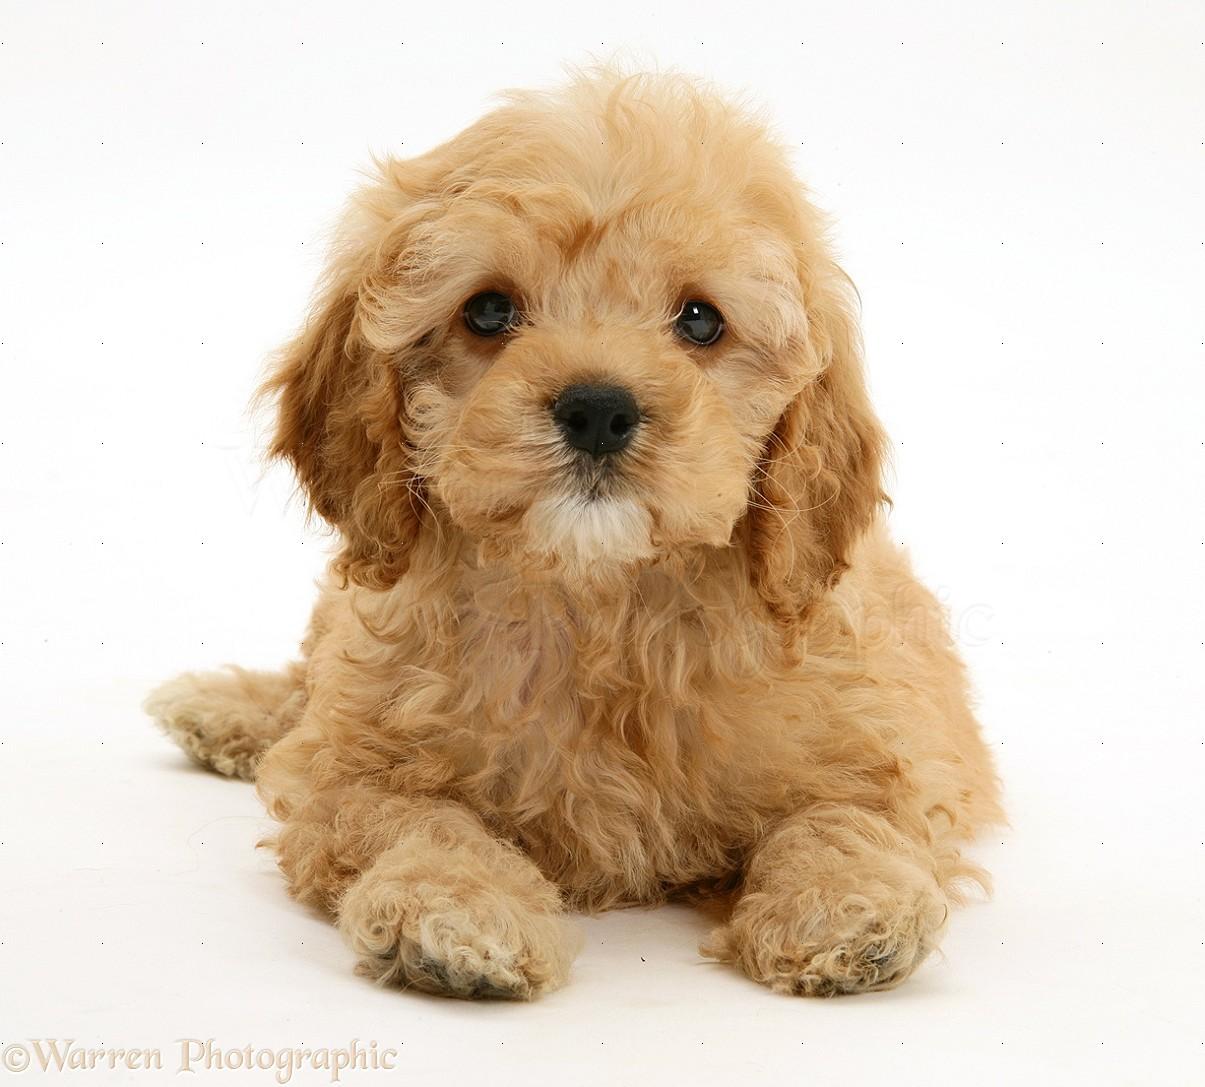 Dog American Cockapoo Puppy 8 Weeks Old Photo Wp17017